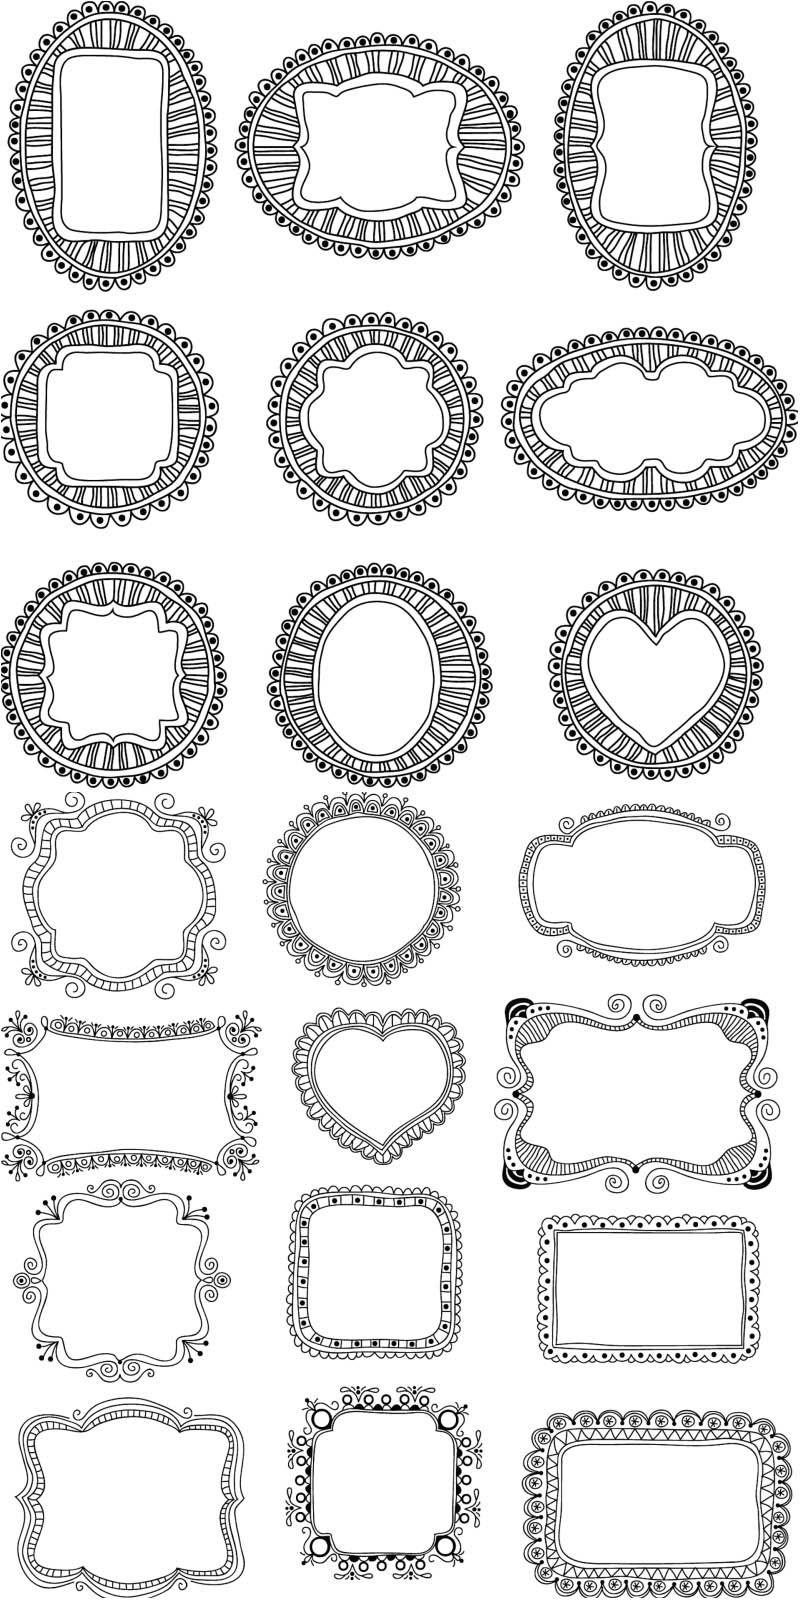 Free Vintage ornate frames vector | Brocade, Flourish, Scrolling ...